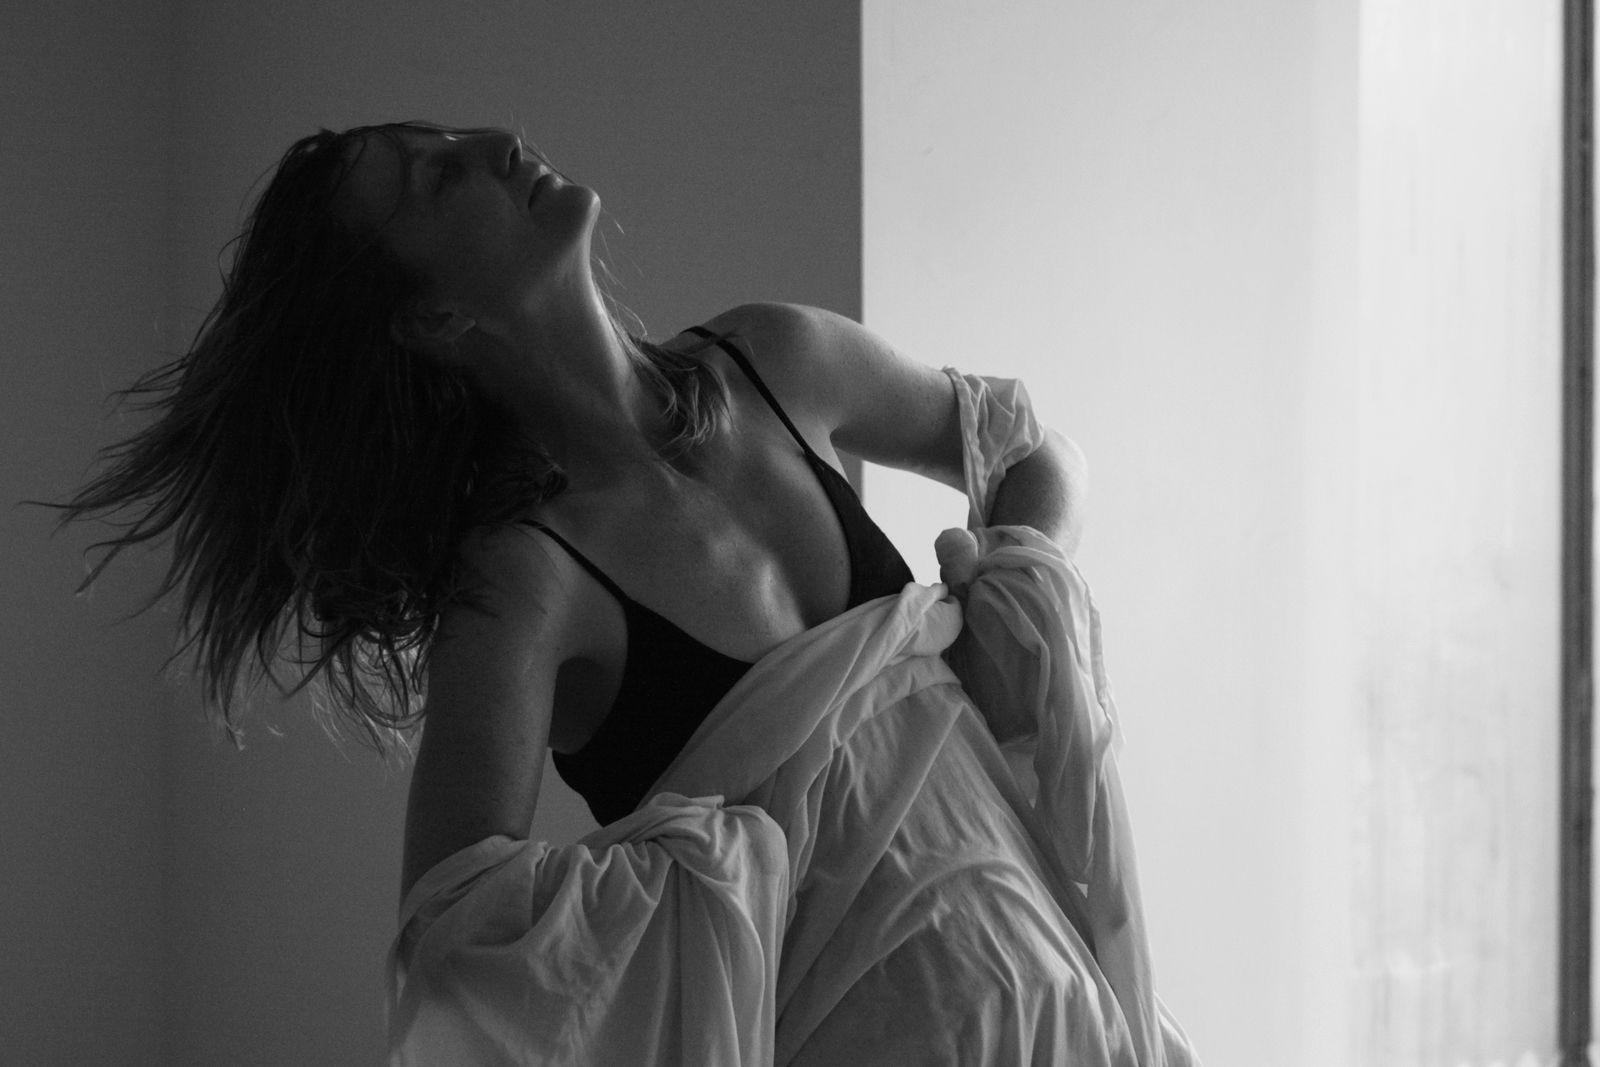 Camille Renarhd